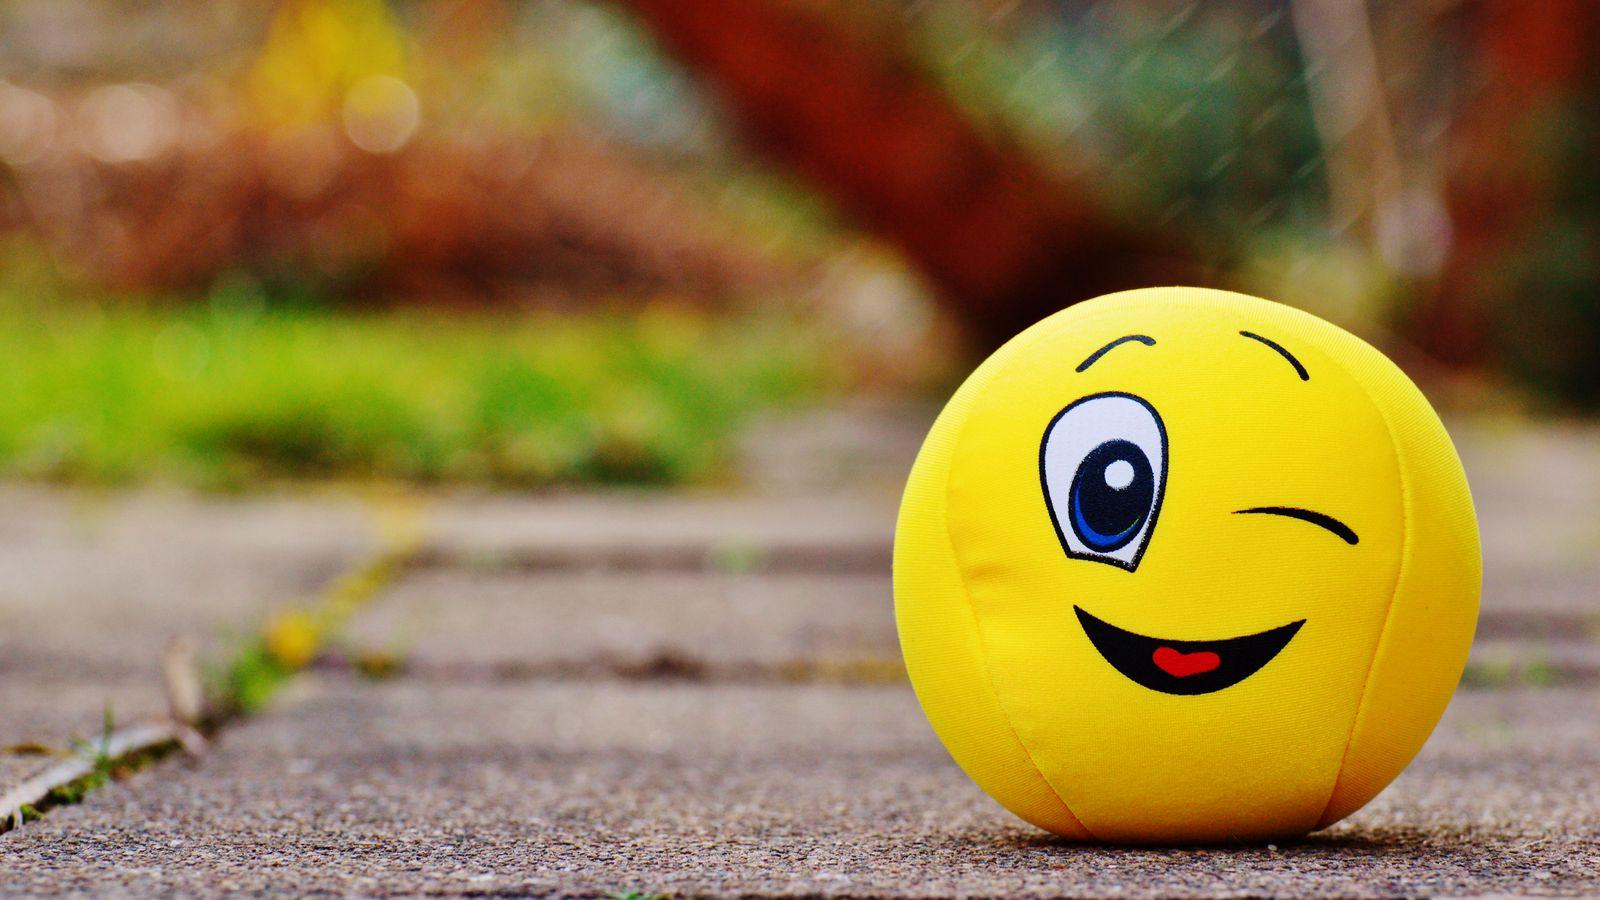 1600x900 Wallpaper ball, smile, happy, toy